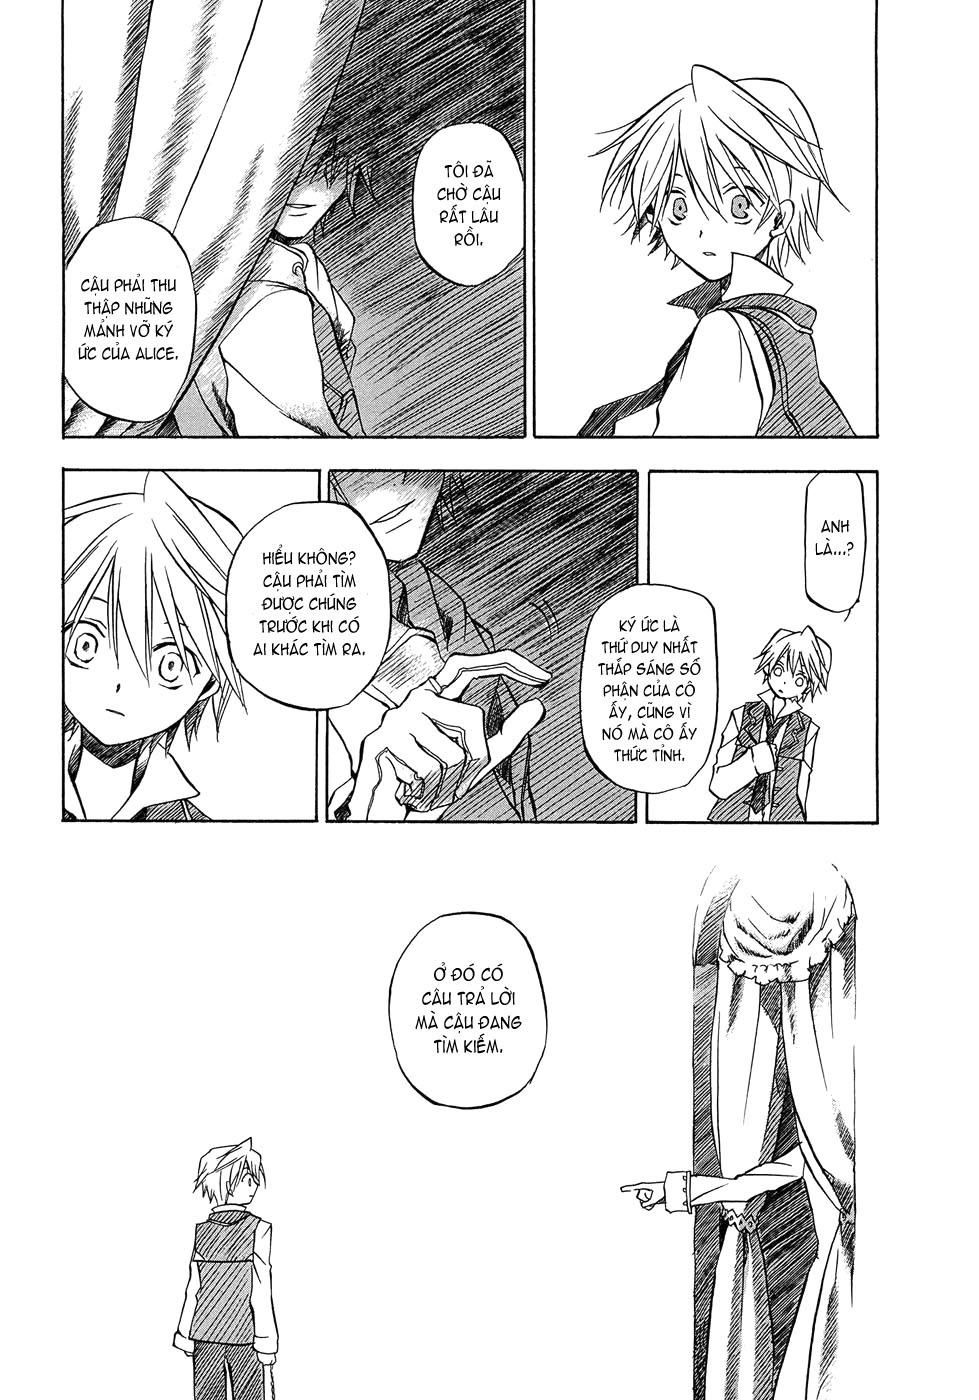 Pandora Hearts chương 004 - retrace: iv rendezvous trang 32